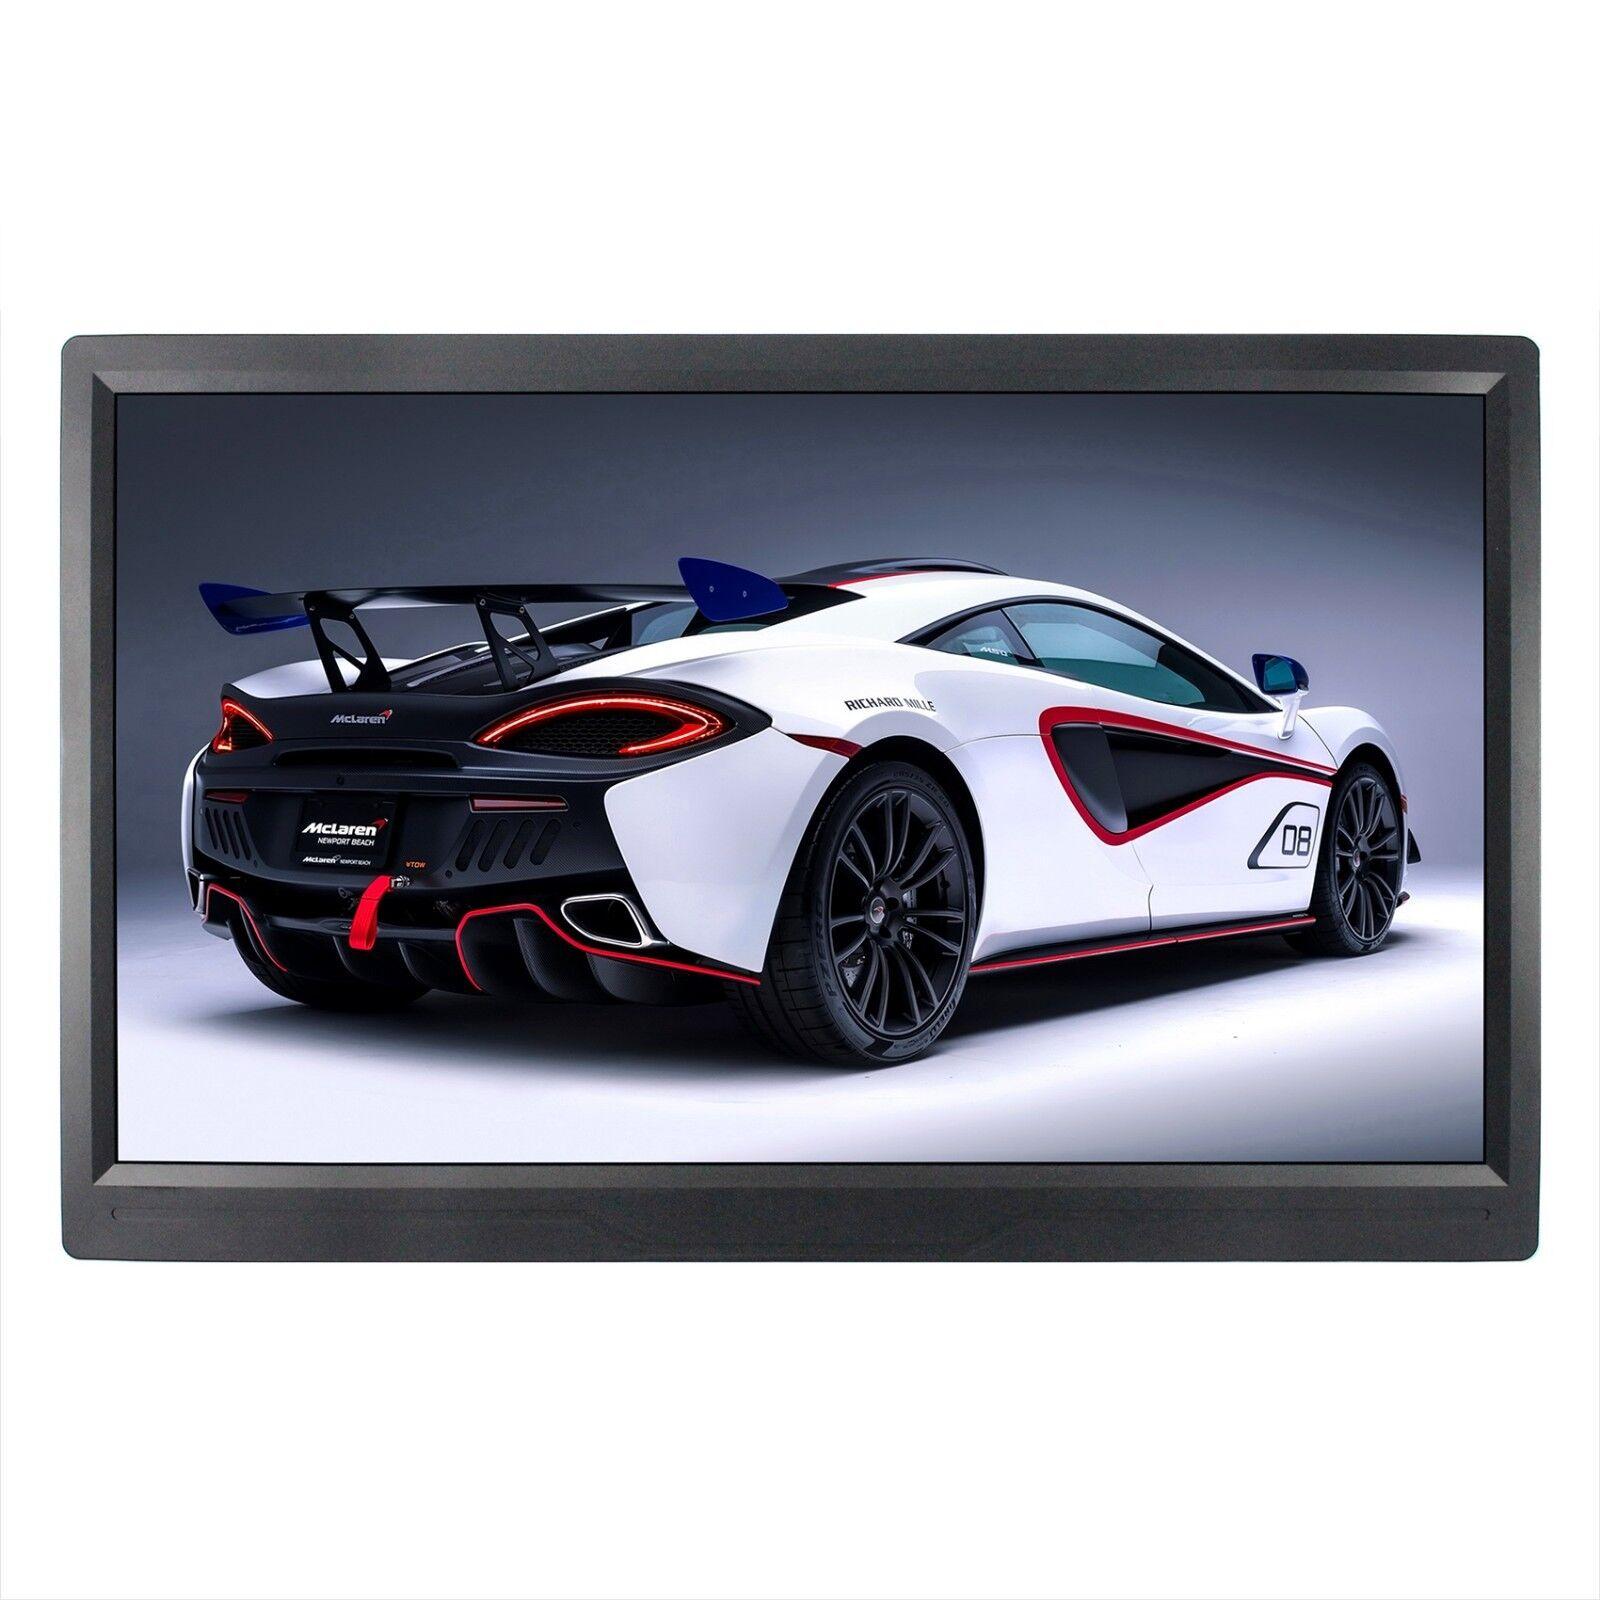 "15.6"" 4K ABS LCD Monitor 3840x2160 HDMI Input Speaker Build"